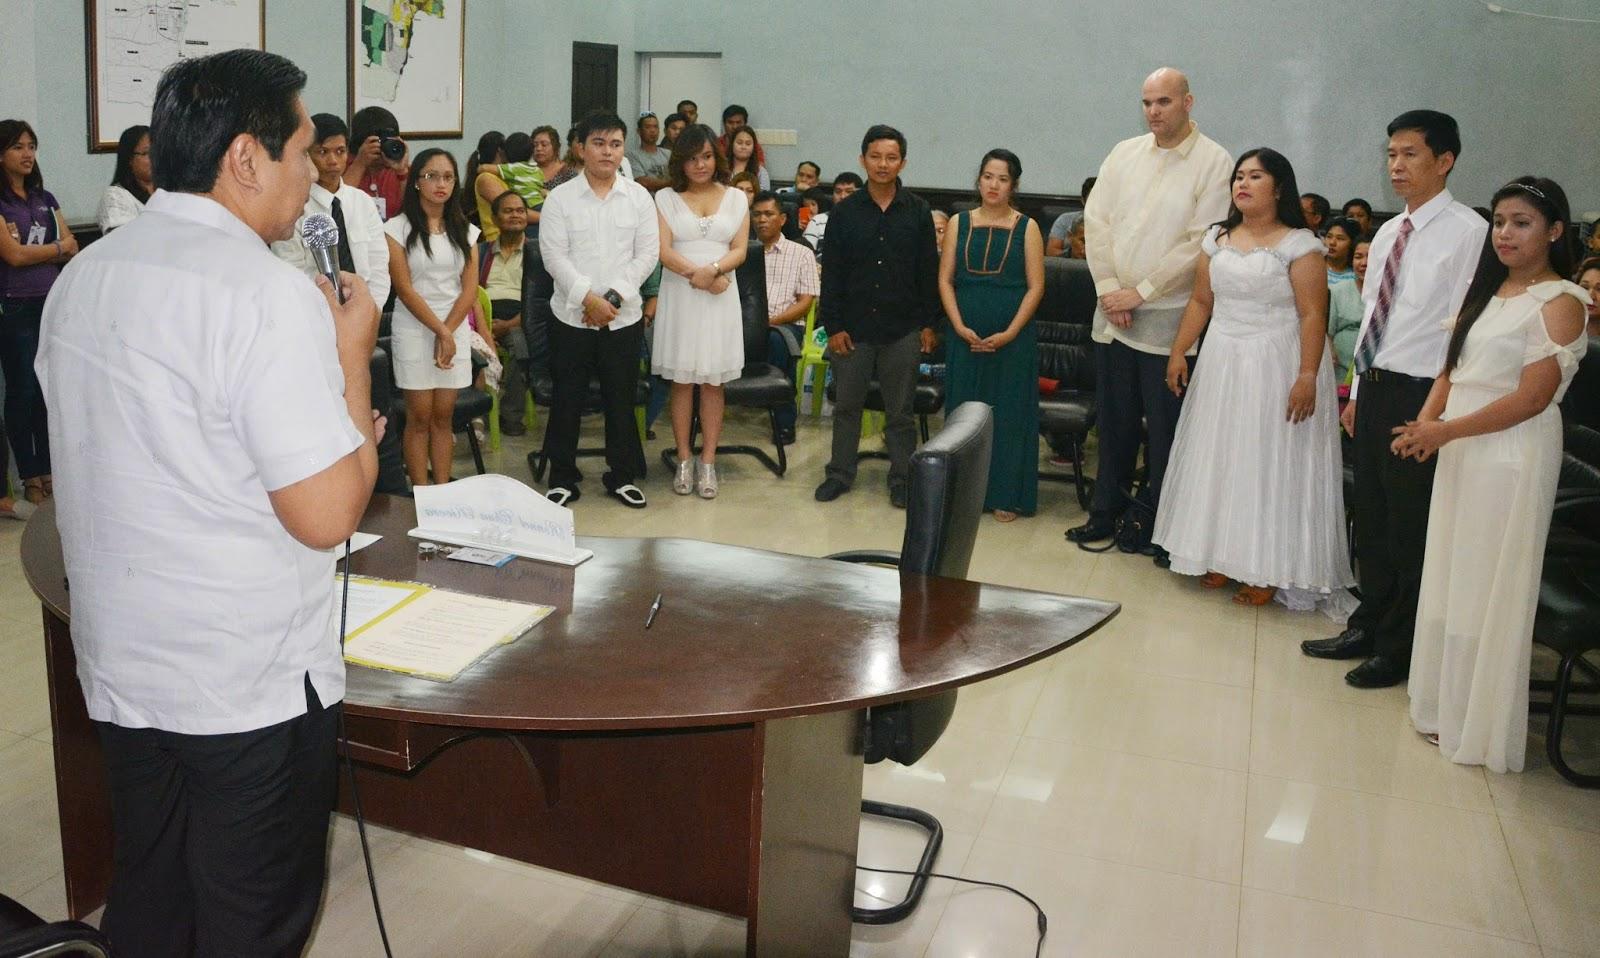 philippines civil wedding ceremony fashion dresses On civil wedding dress philippines